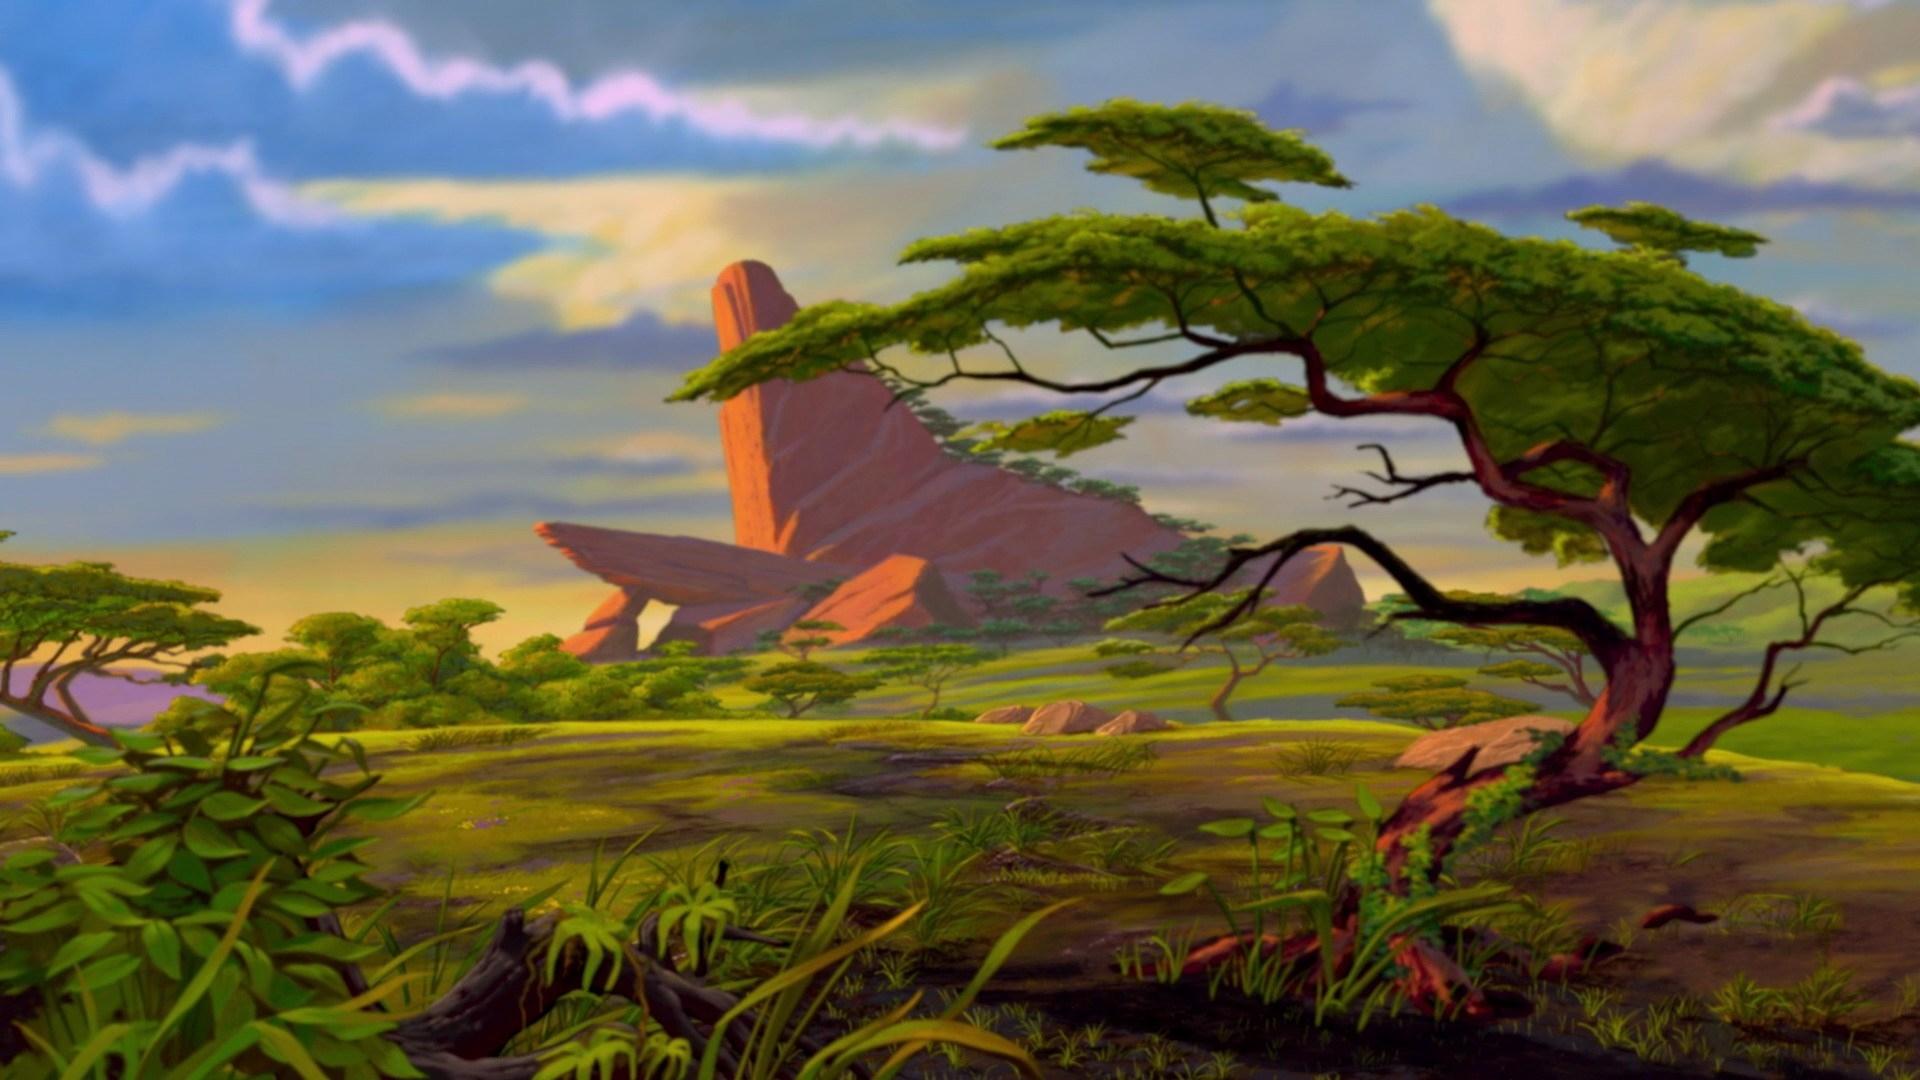 Lejonkungen (Disney's Skurk) (@adamjmachin) Cover Image